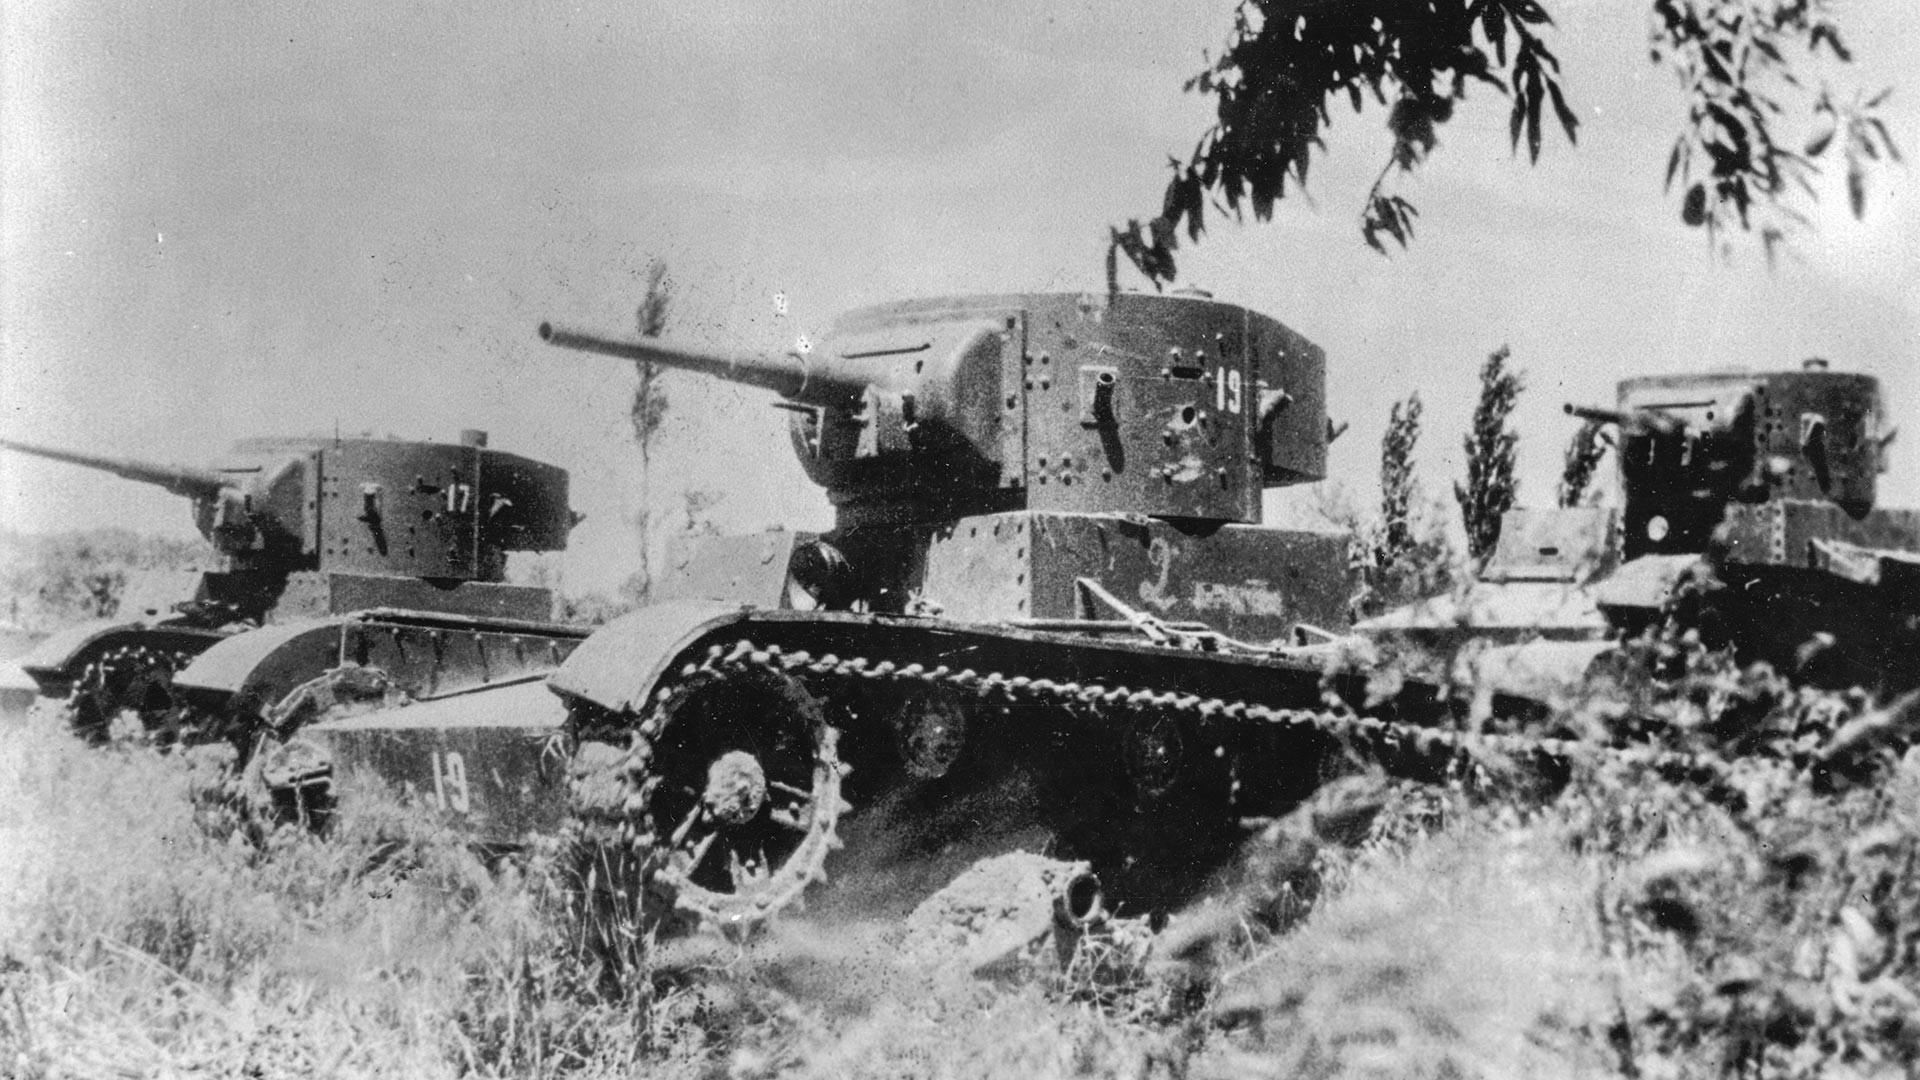 Tanques soviéticos T-26 en España.